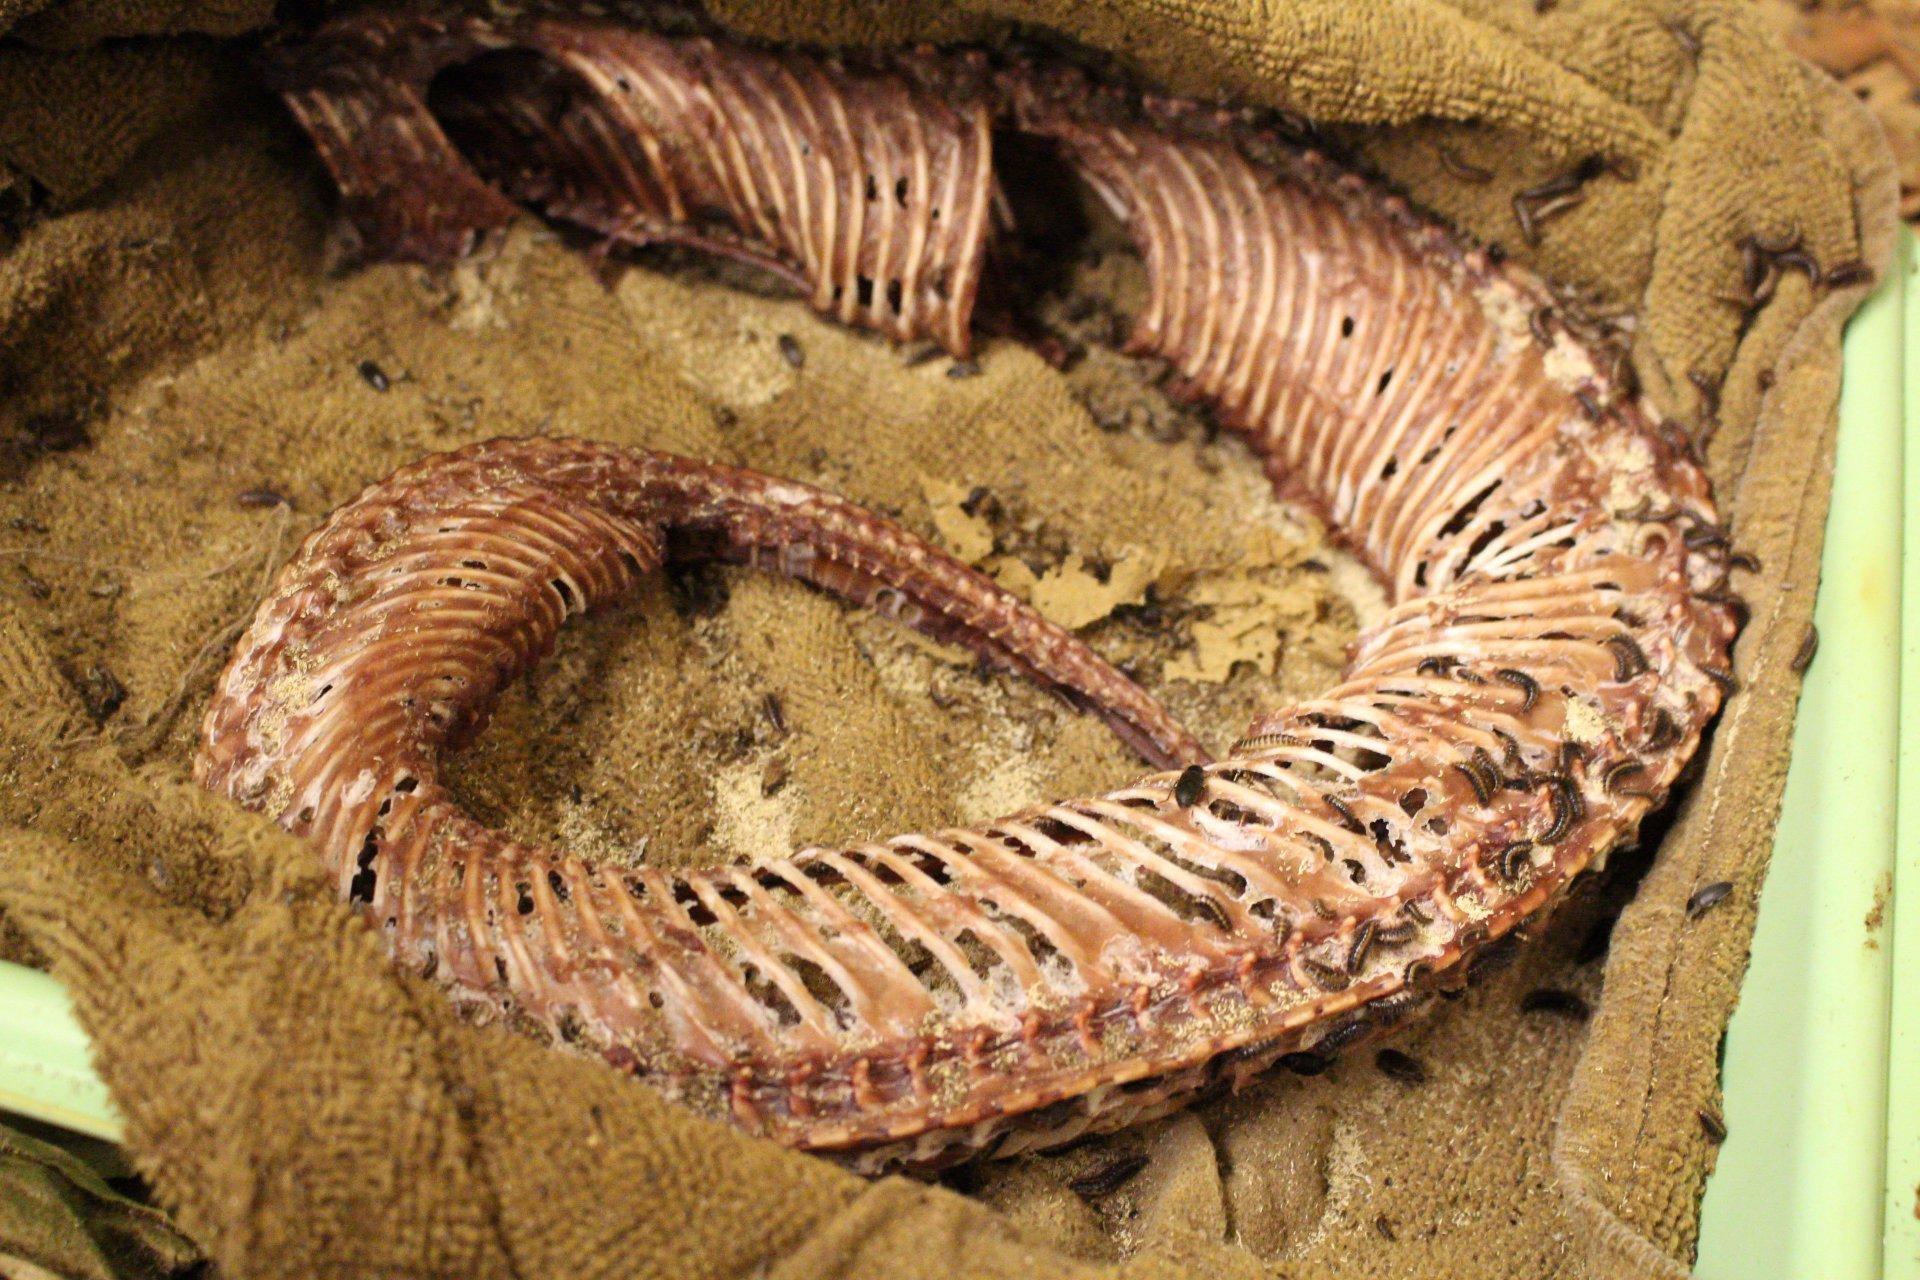 Dermestid beetles feasting on a snake carcass at the HSU Vertebrate Museum. Photo by Walter Hackett